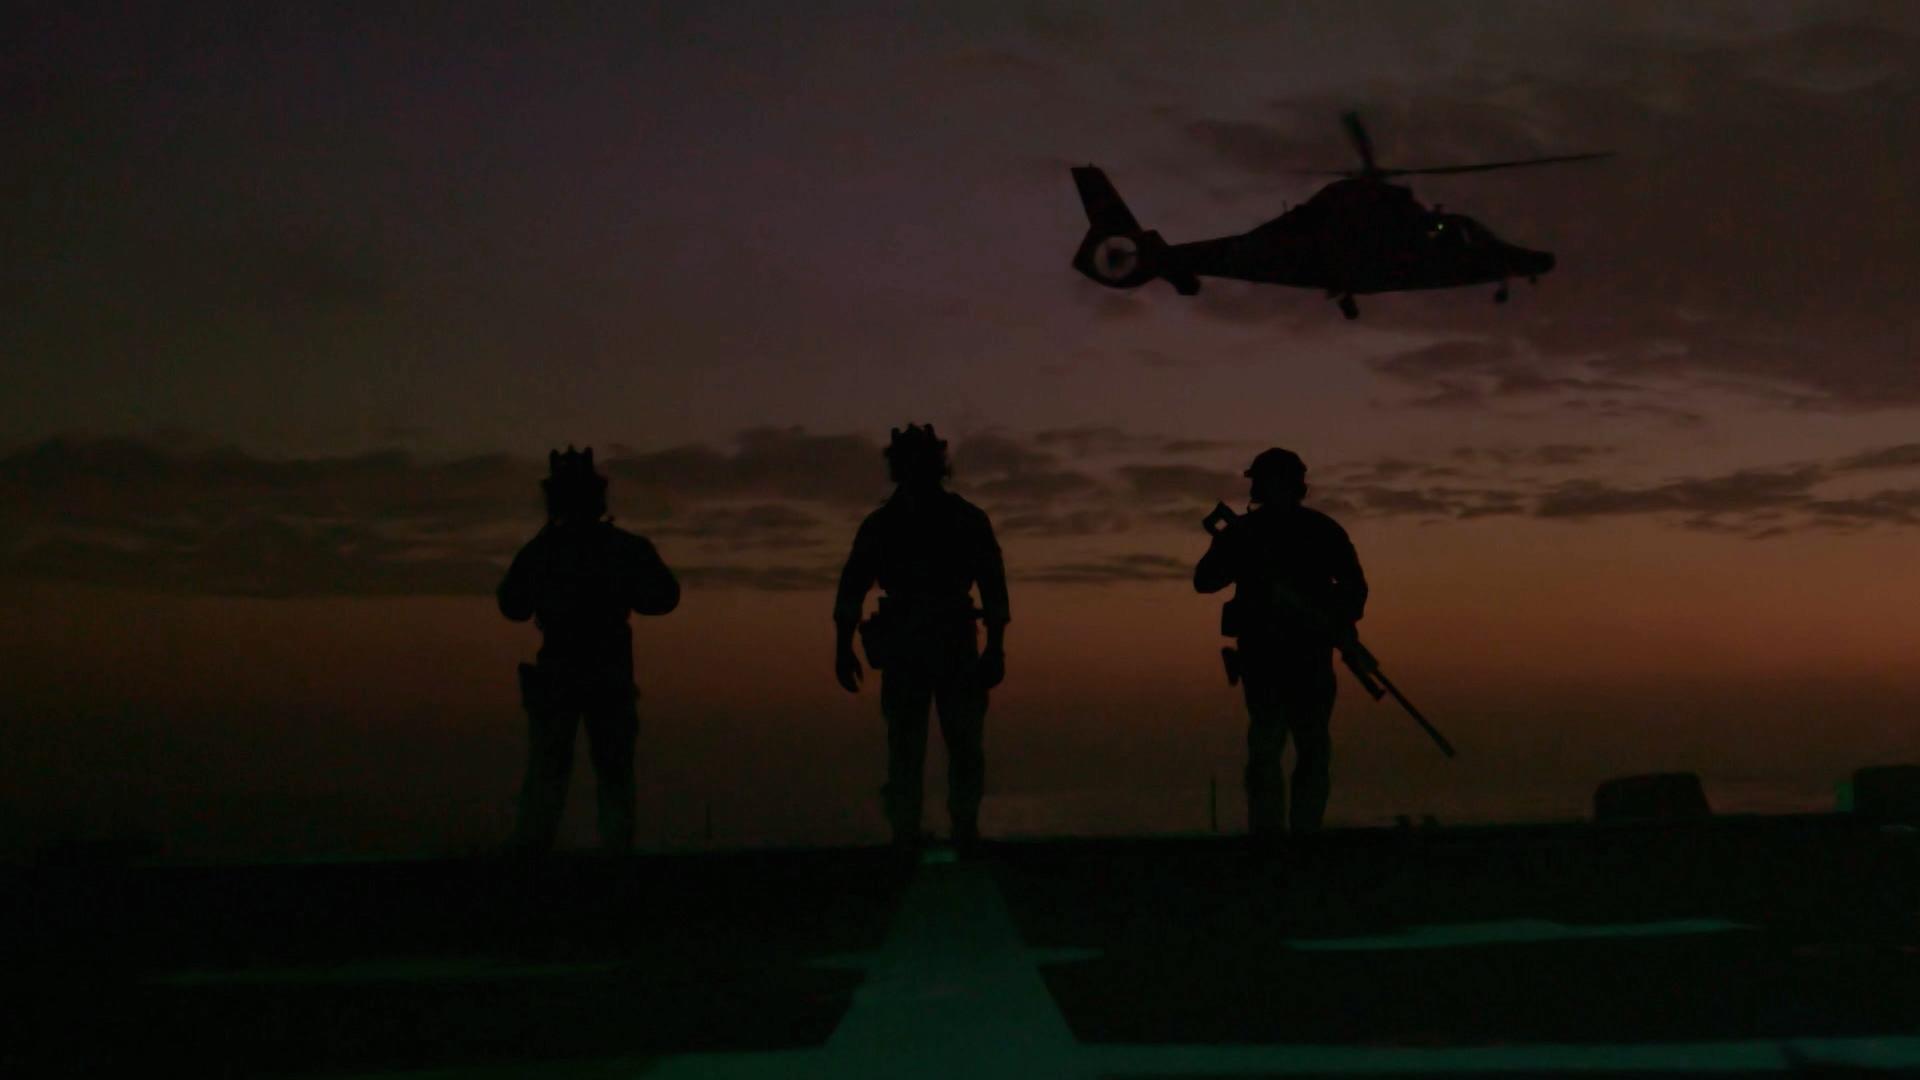 Coast Guard: Mission Critical : Night Shift